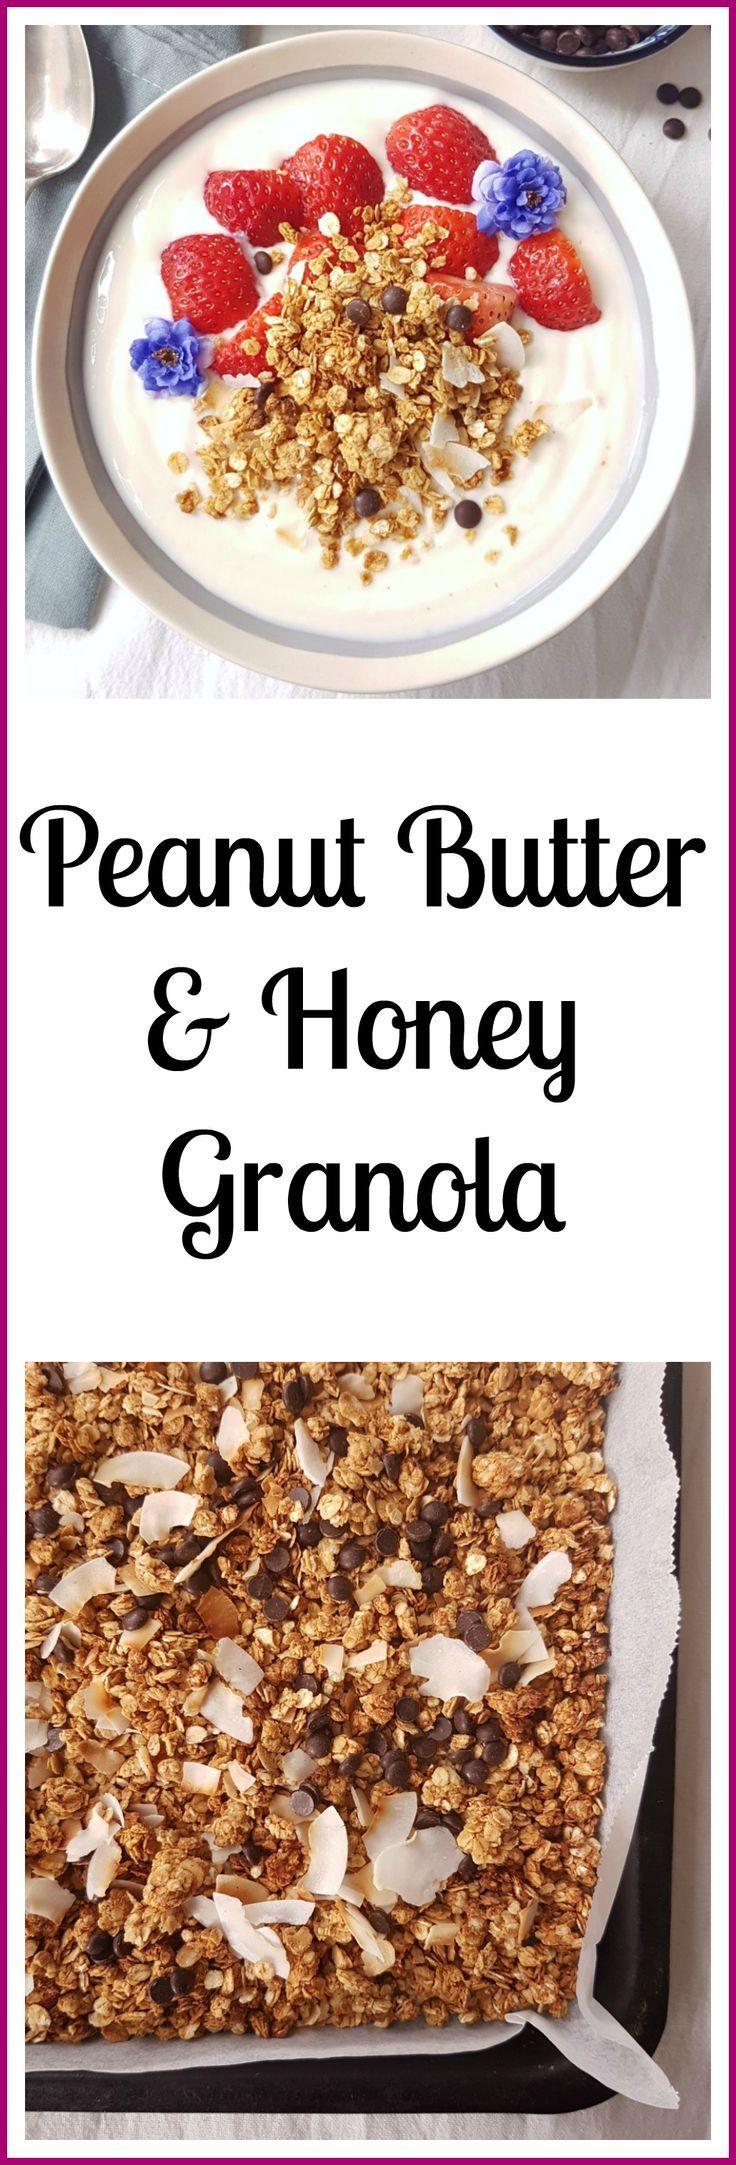 Peanut Butter and Honey Granola. - #butter #granola #honey #peanut - #new - #but